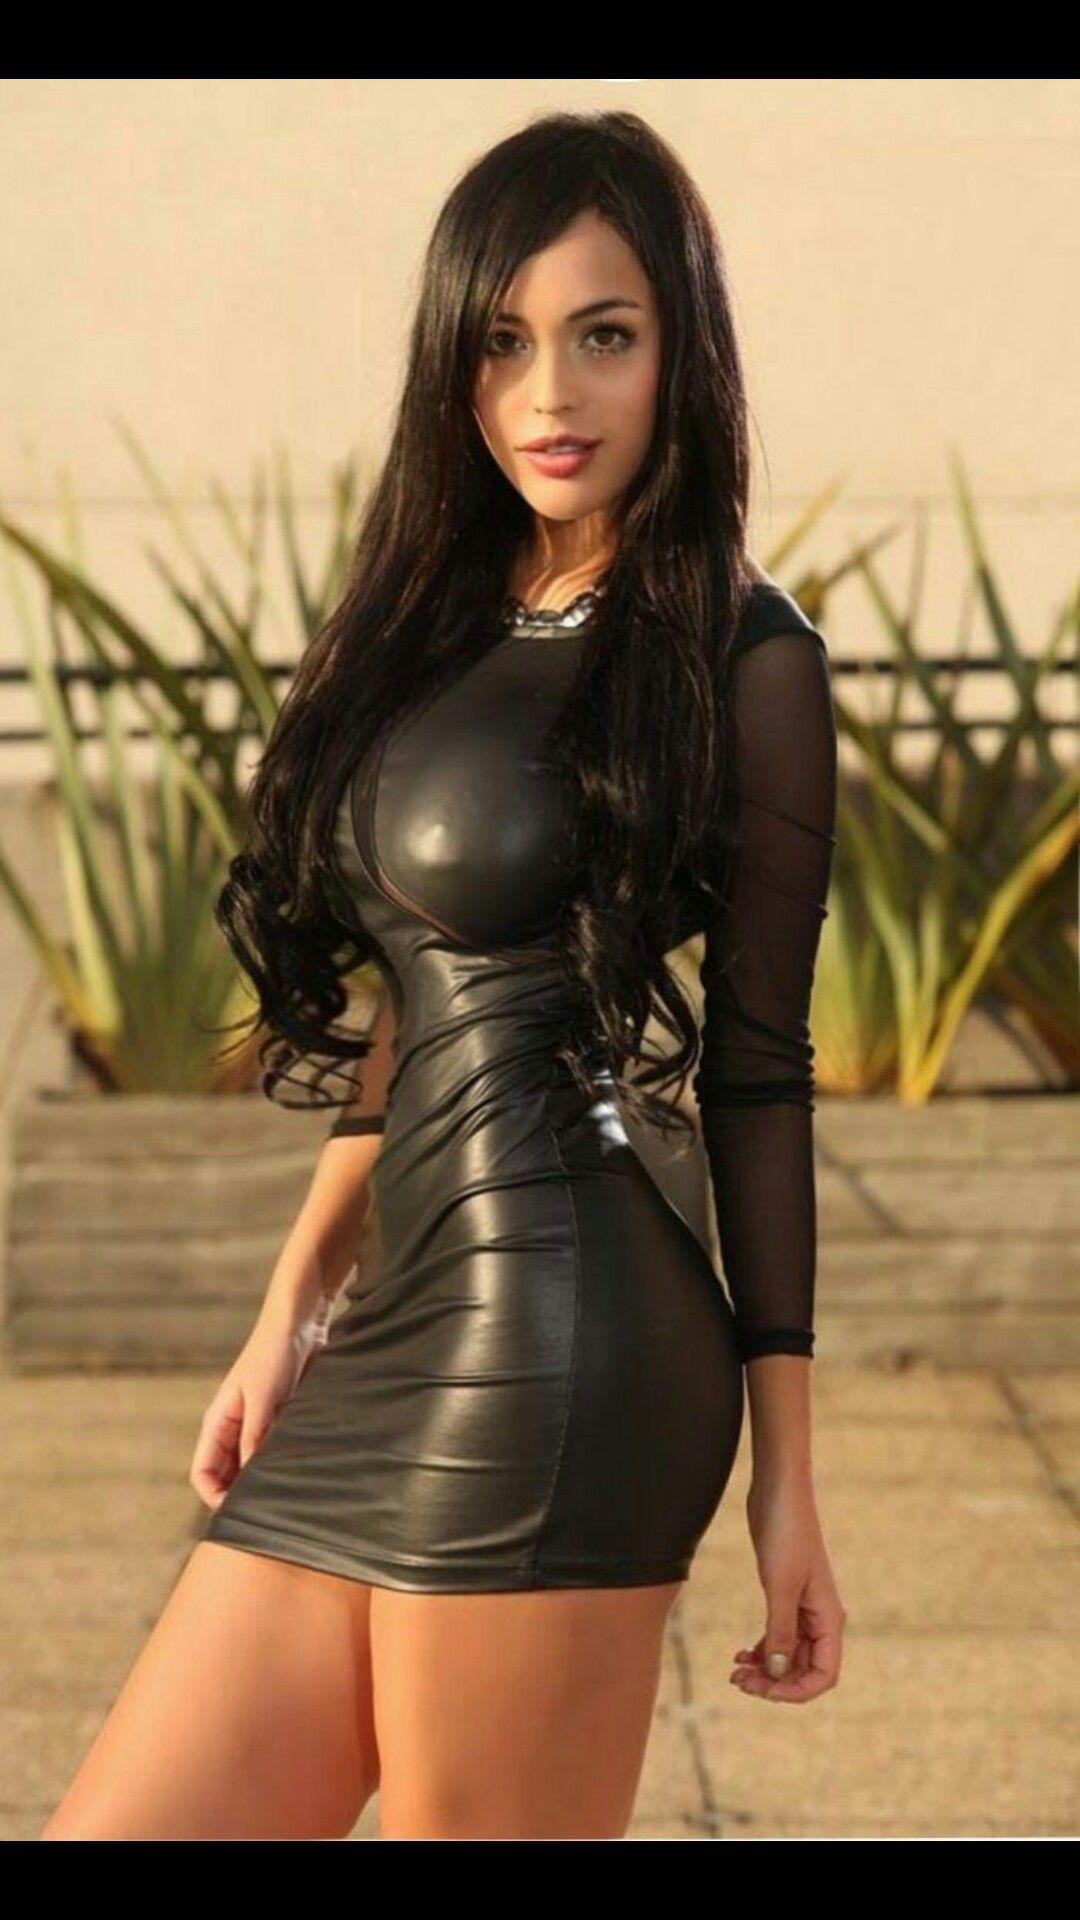 Tara reid boob pic